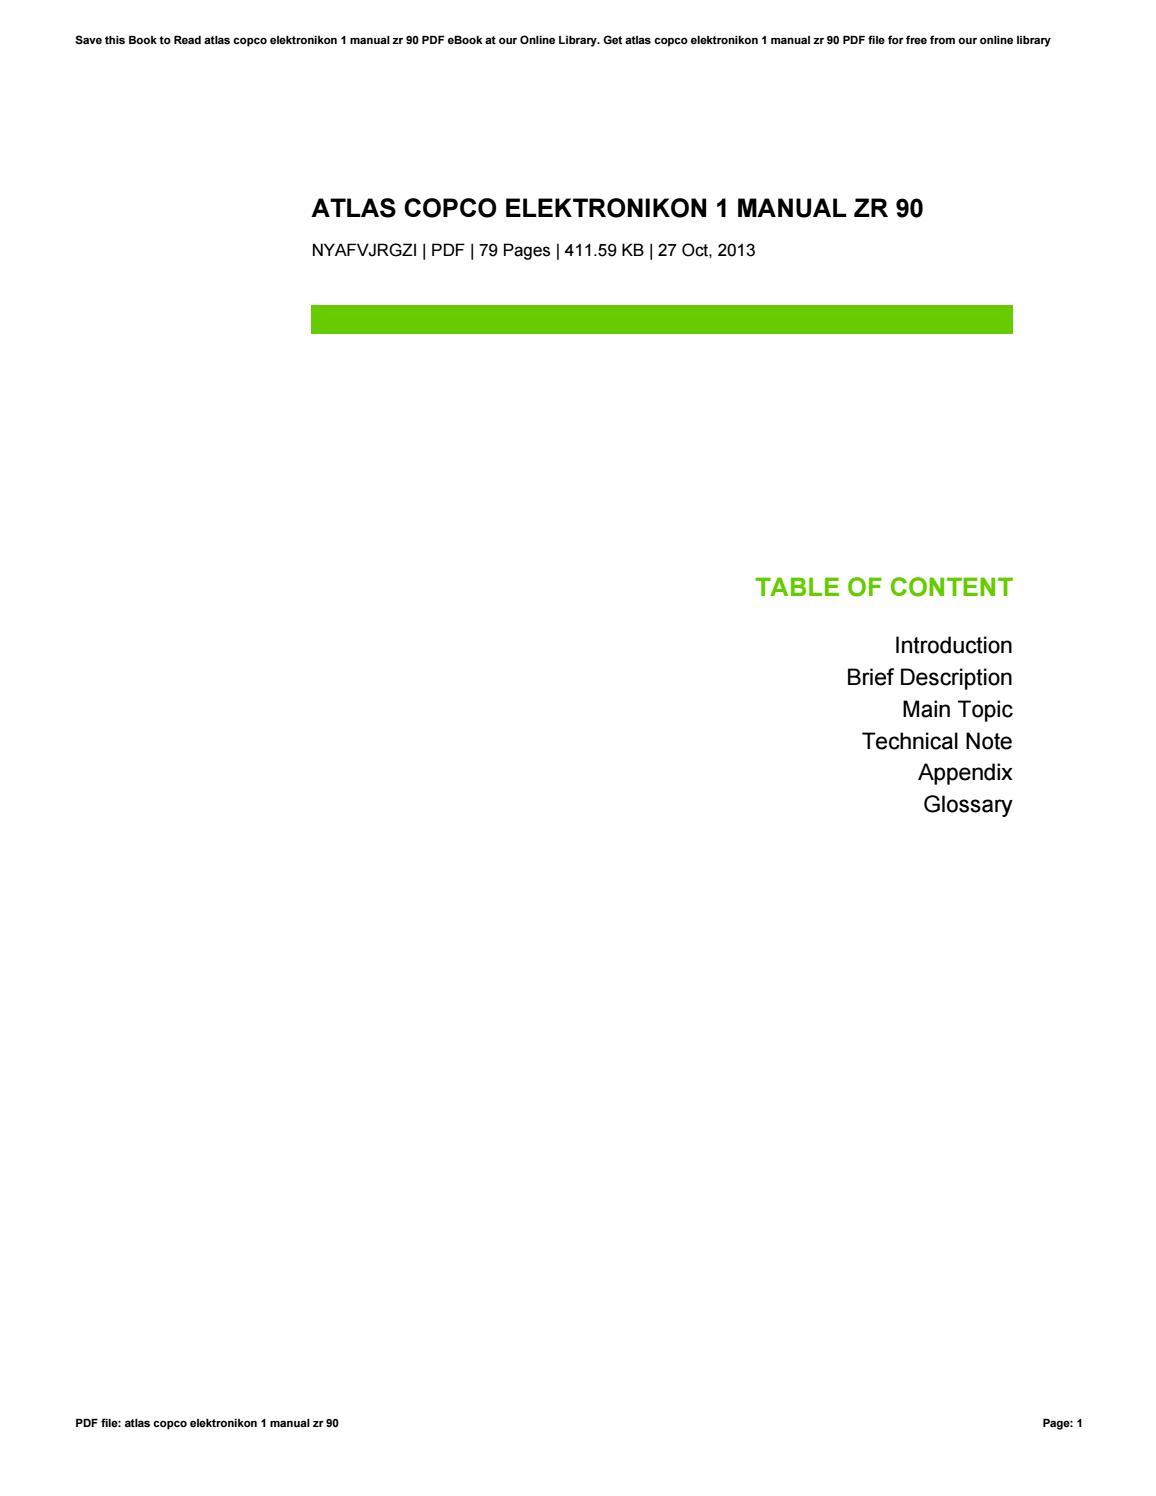 (PDF) Atlas Copco Stationary Air Compressors User manual ...